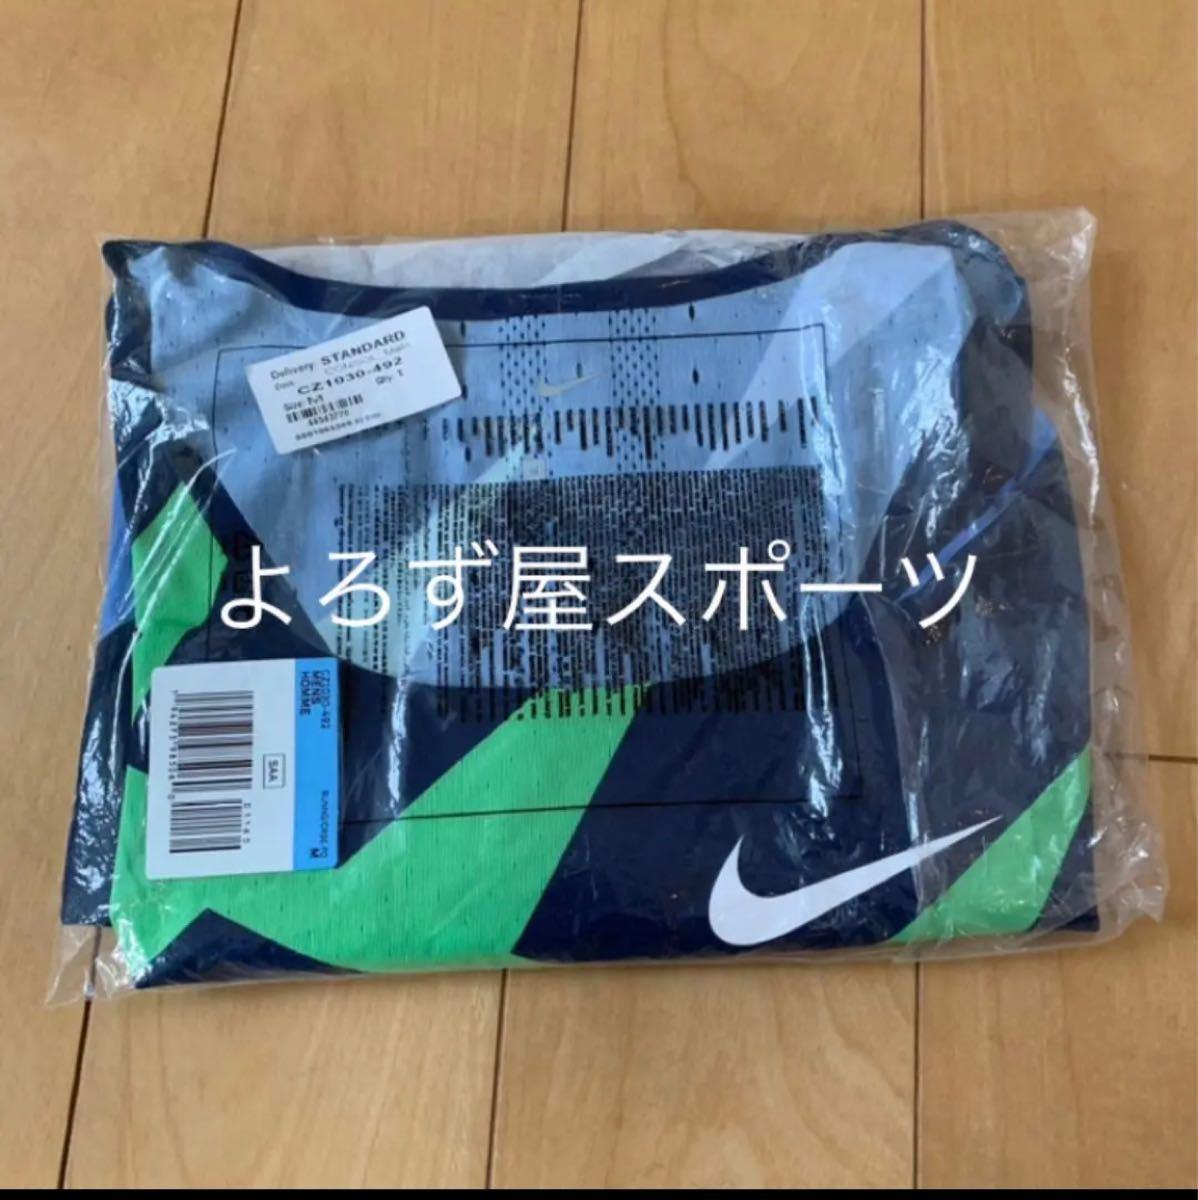 【Mサイズ】Nike pro elite エアロスイフト オレゴンプロジェクト